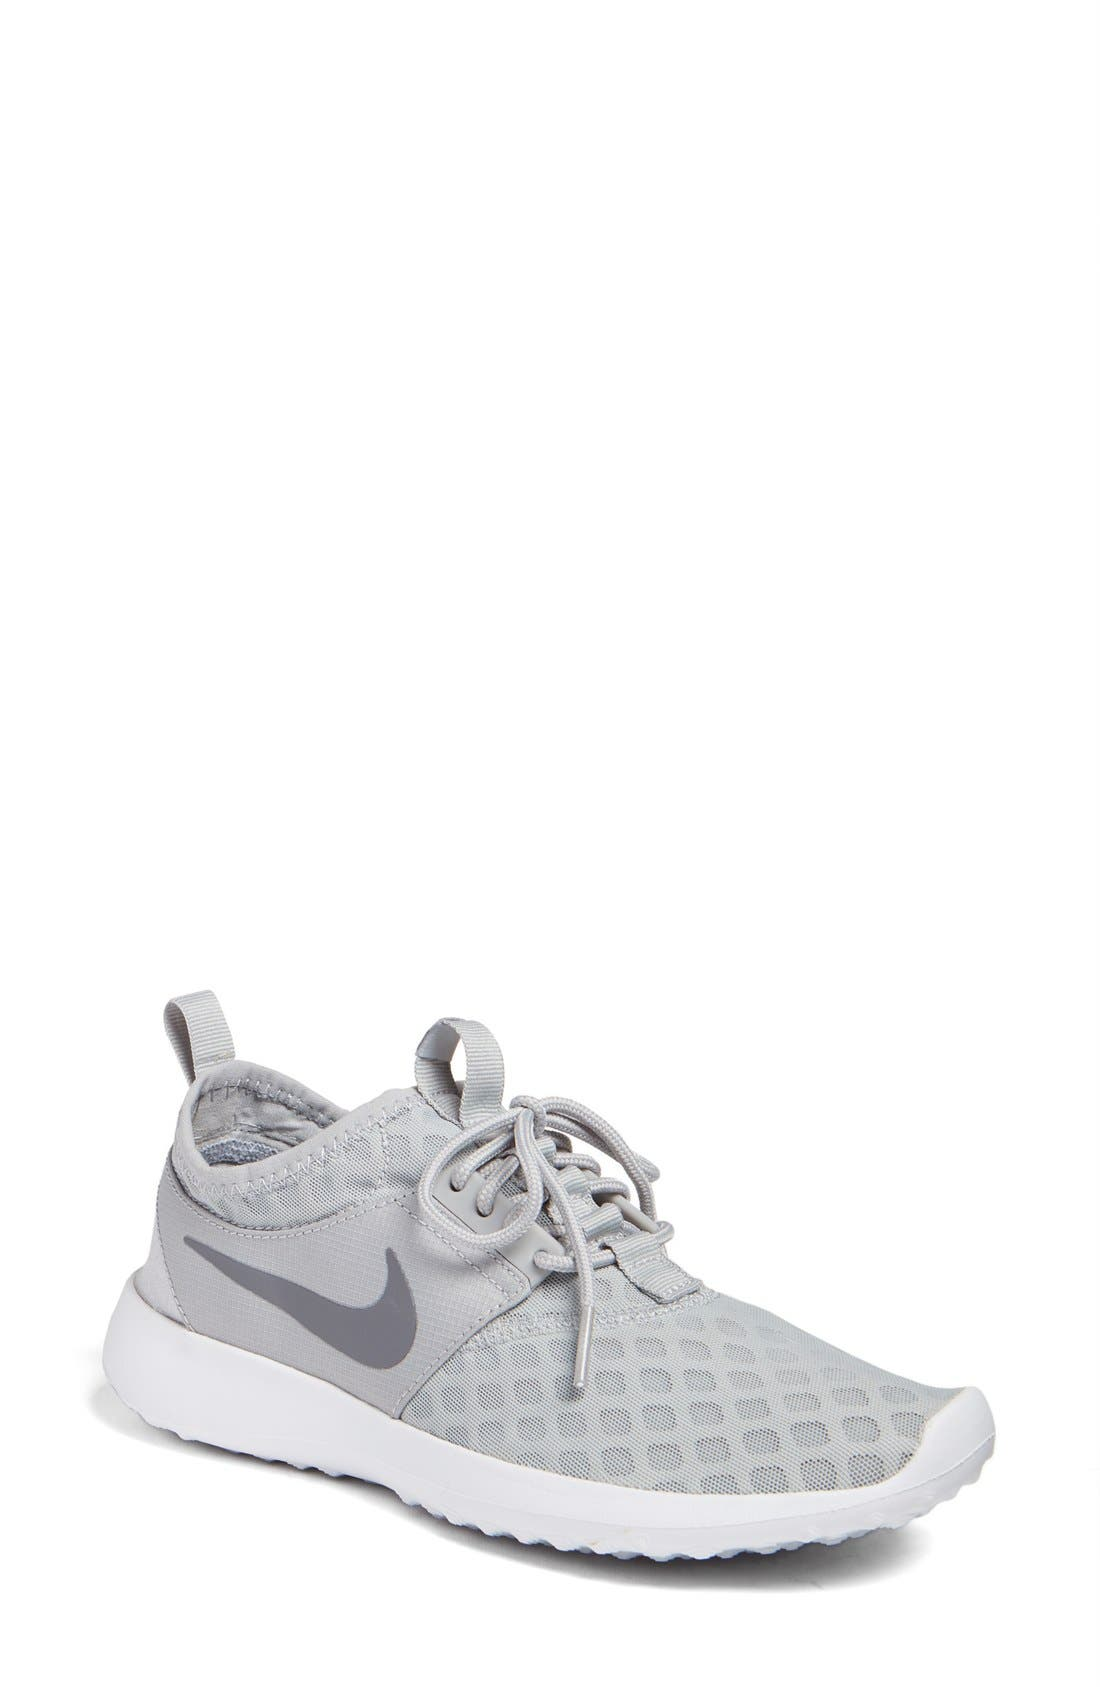 Main Image - Nike Juvenate Sneaker (Women)